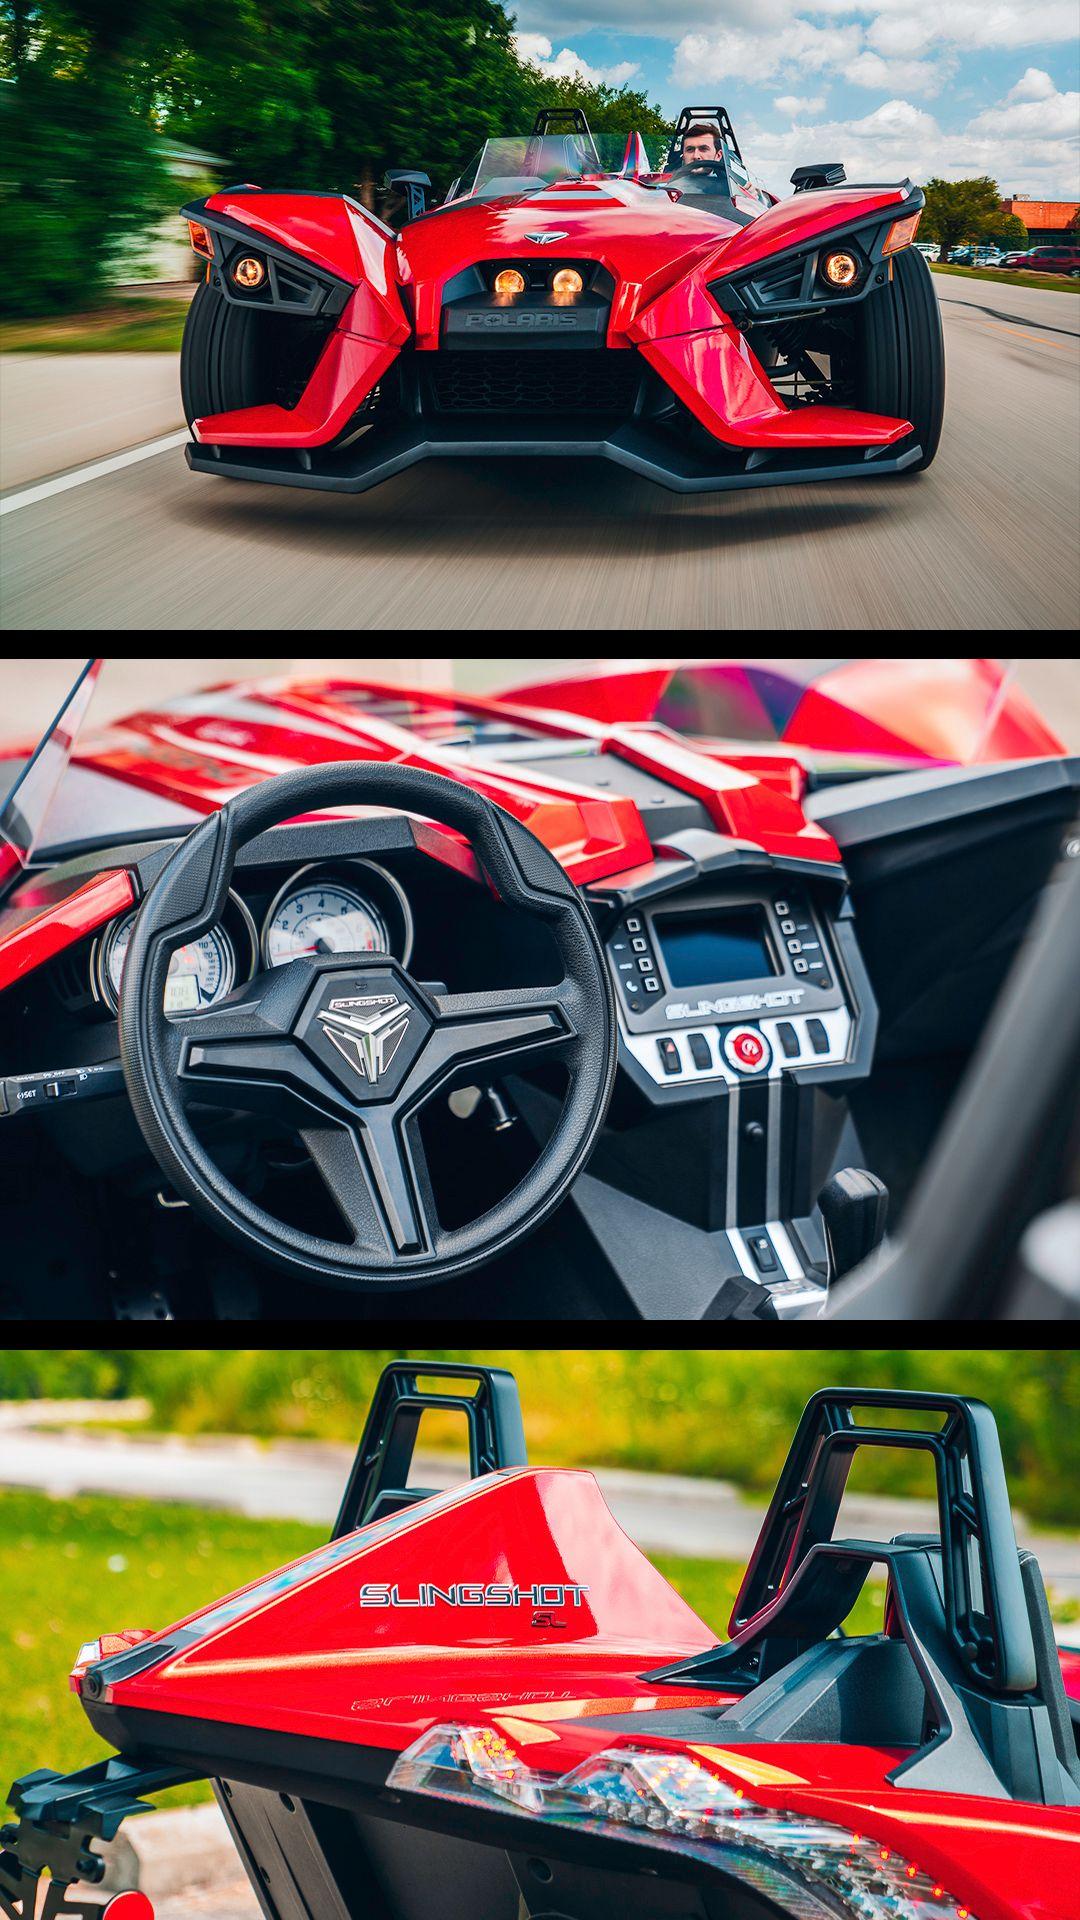 2017 polaris slingshot car dealership slingshot